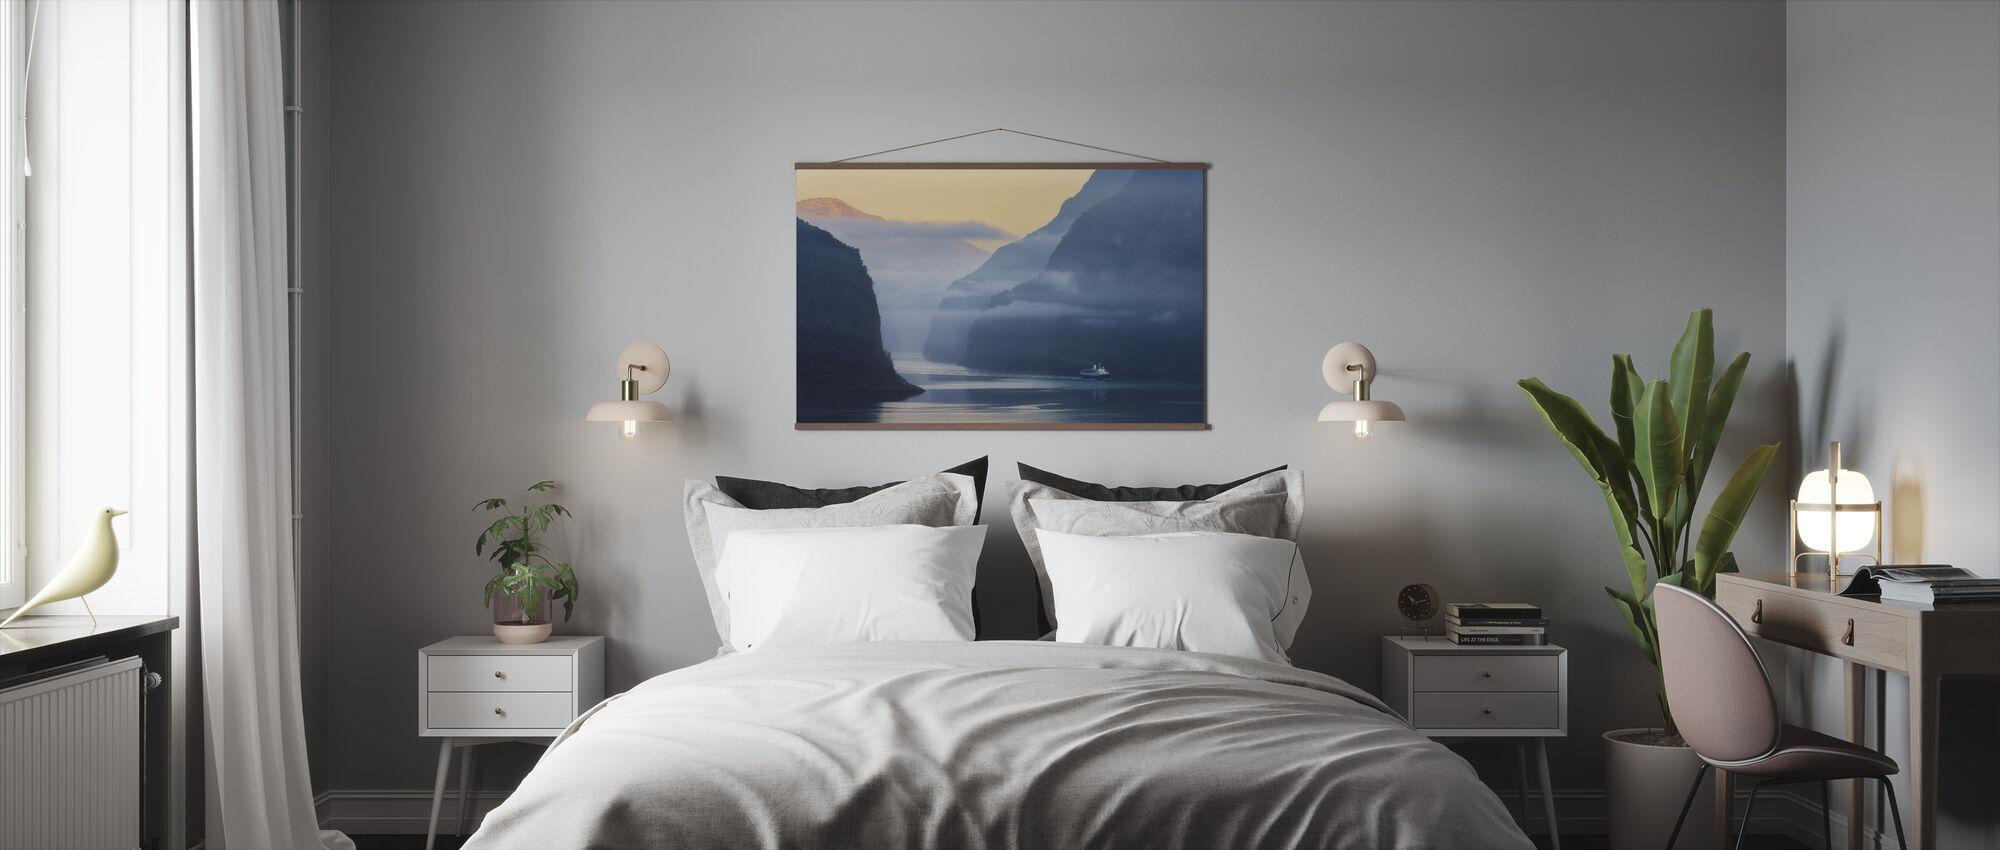 Norwegian Fjord in Fog - Poster - Bedroom